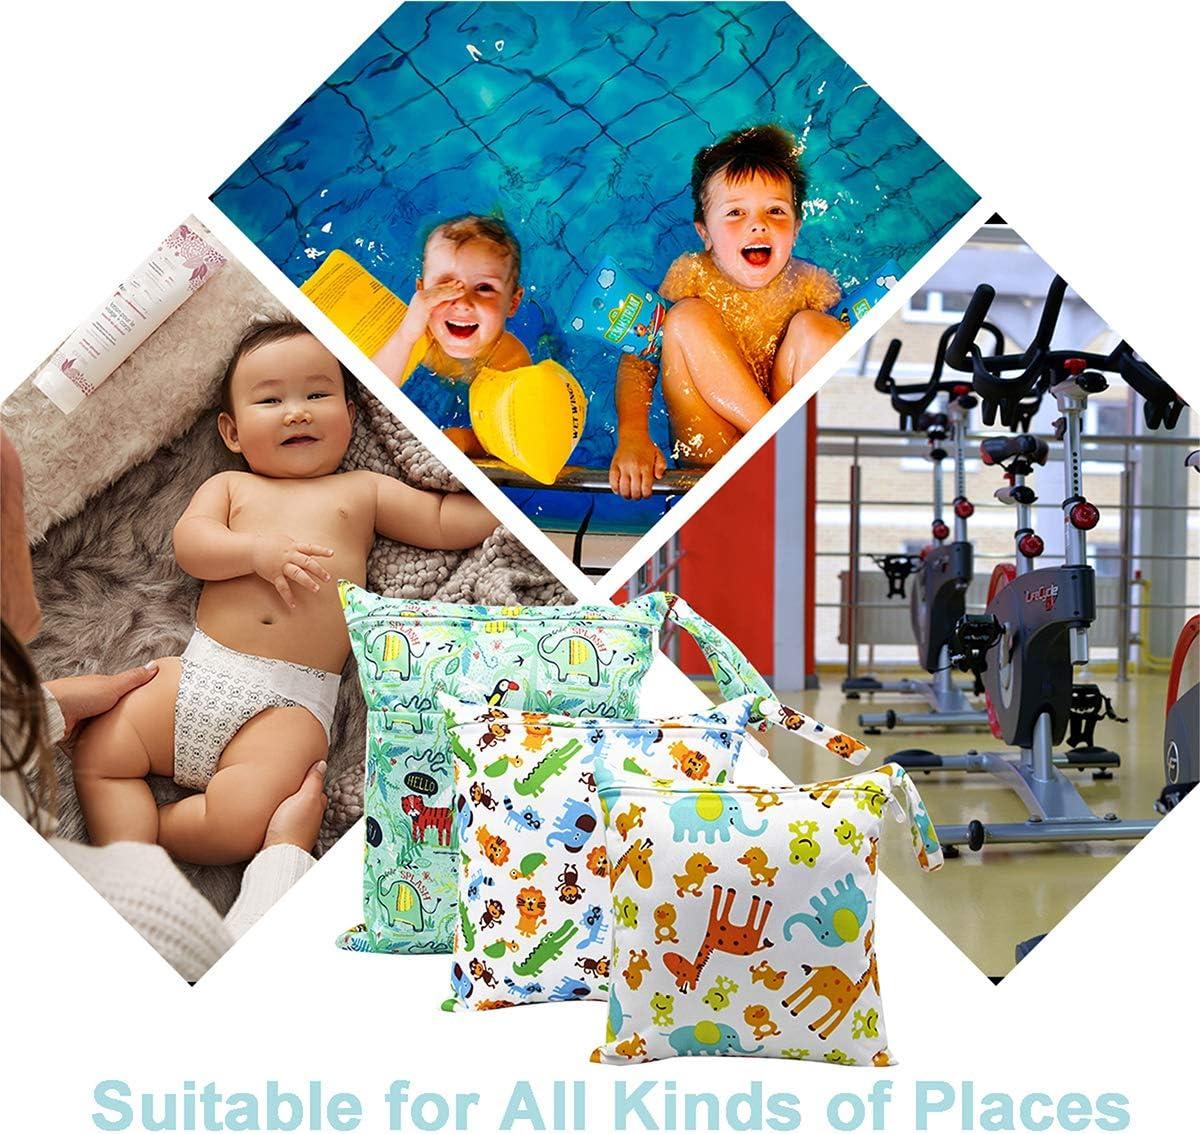 Amarillo Playa Gym Wetbag Port/átil Organizador de Viaje HOTLIKE Bolsa de Pa/ñales 3PCS Beb/é Reutilizable Impermeabilizan Bolsa con Cremallera Impermeable para Mam/á